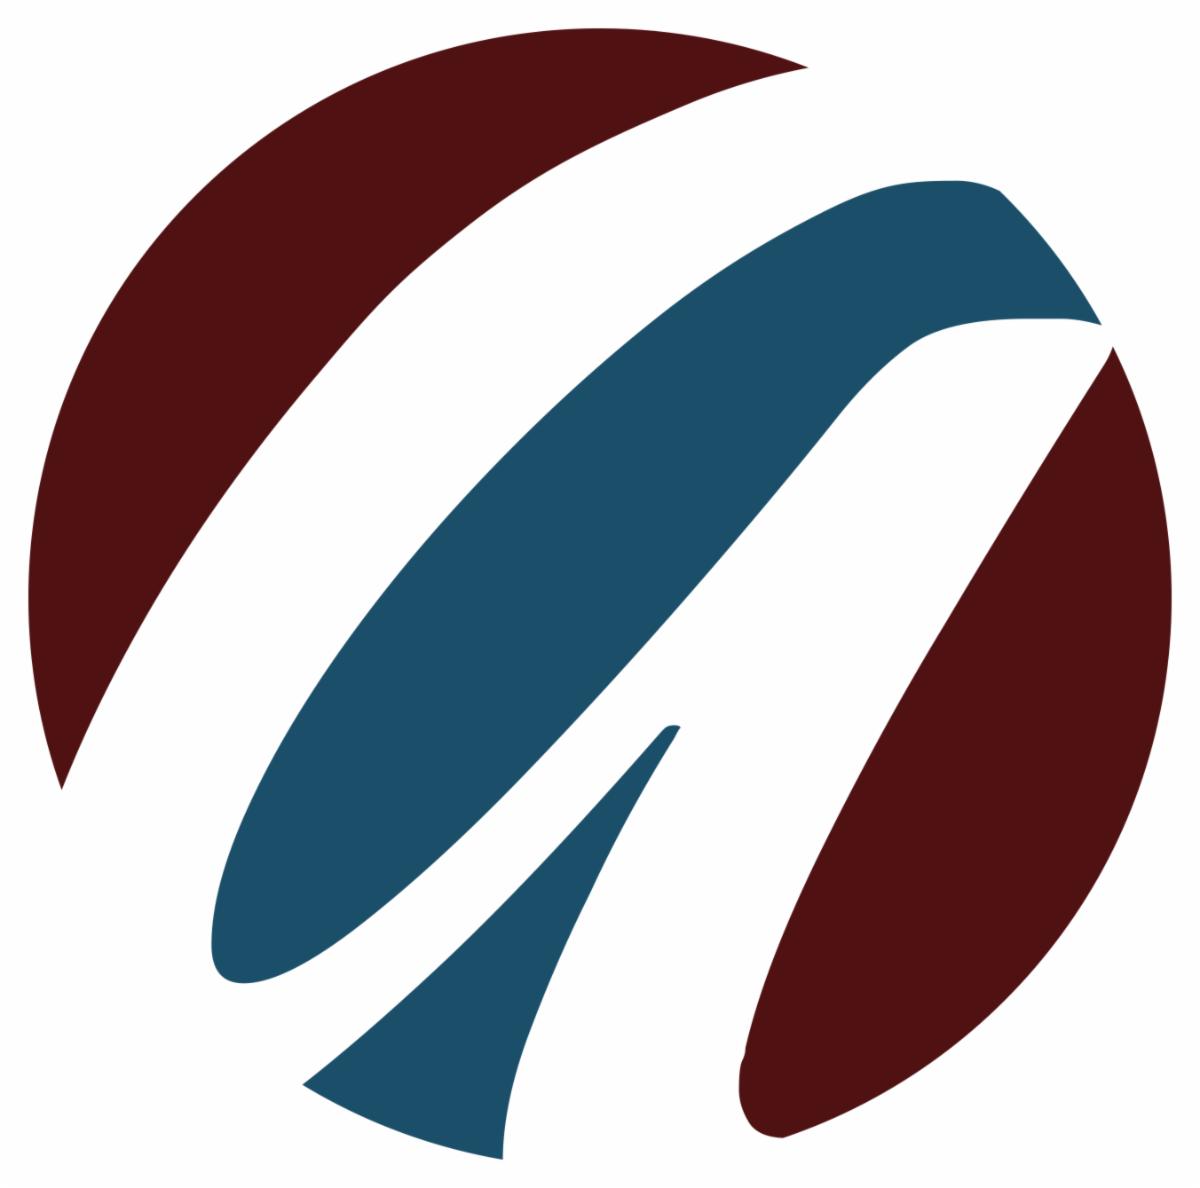 Alerding logo